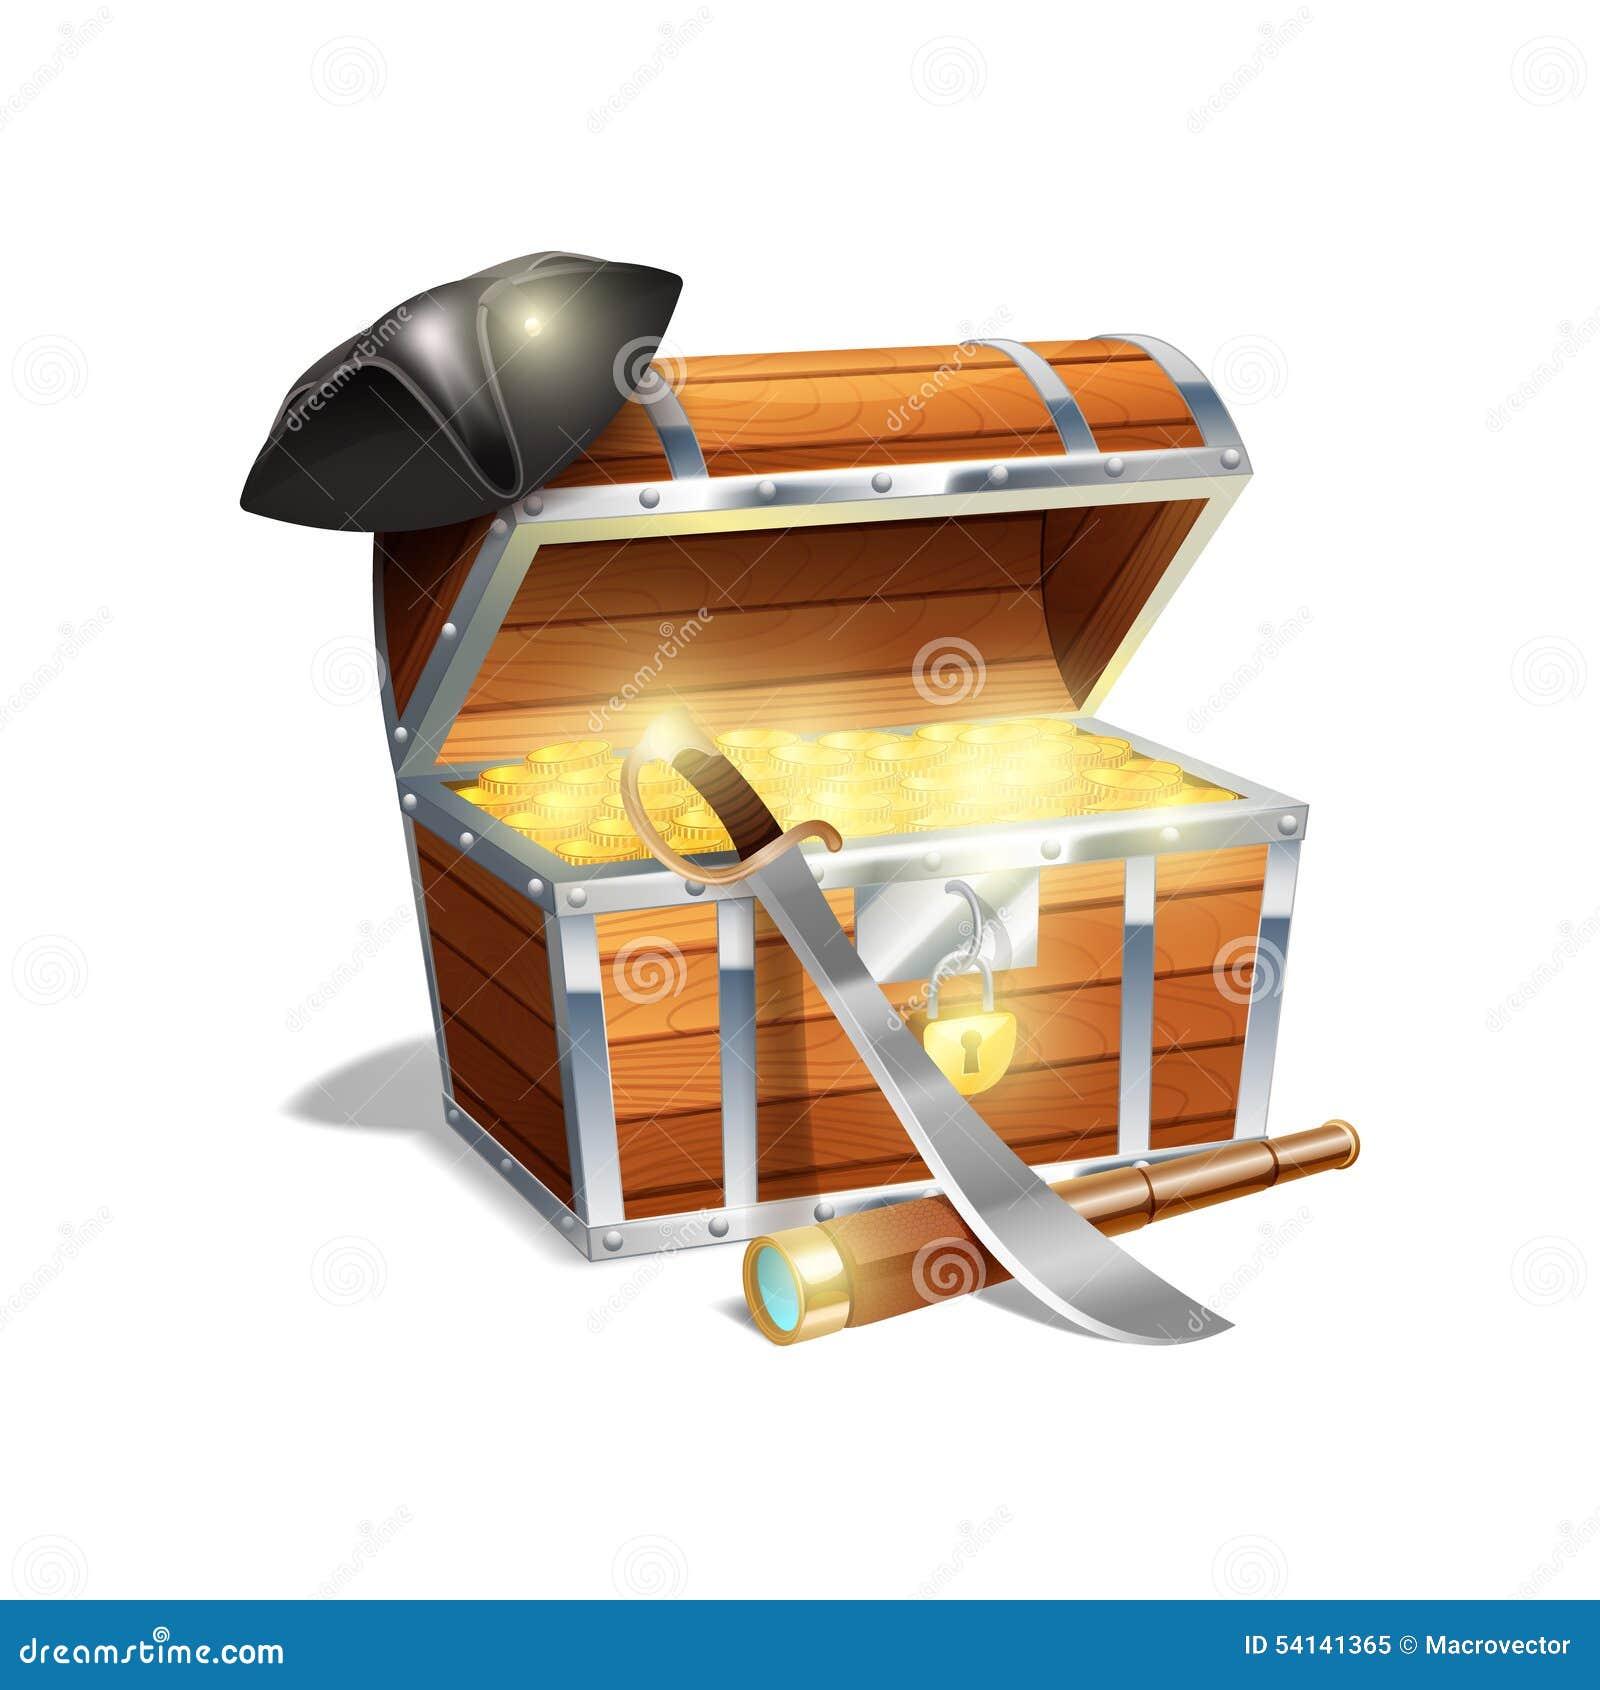 Pirate Treasure Chest Illustration Stock Vector - Image: 54141365